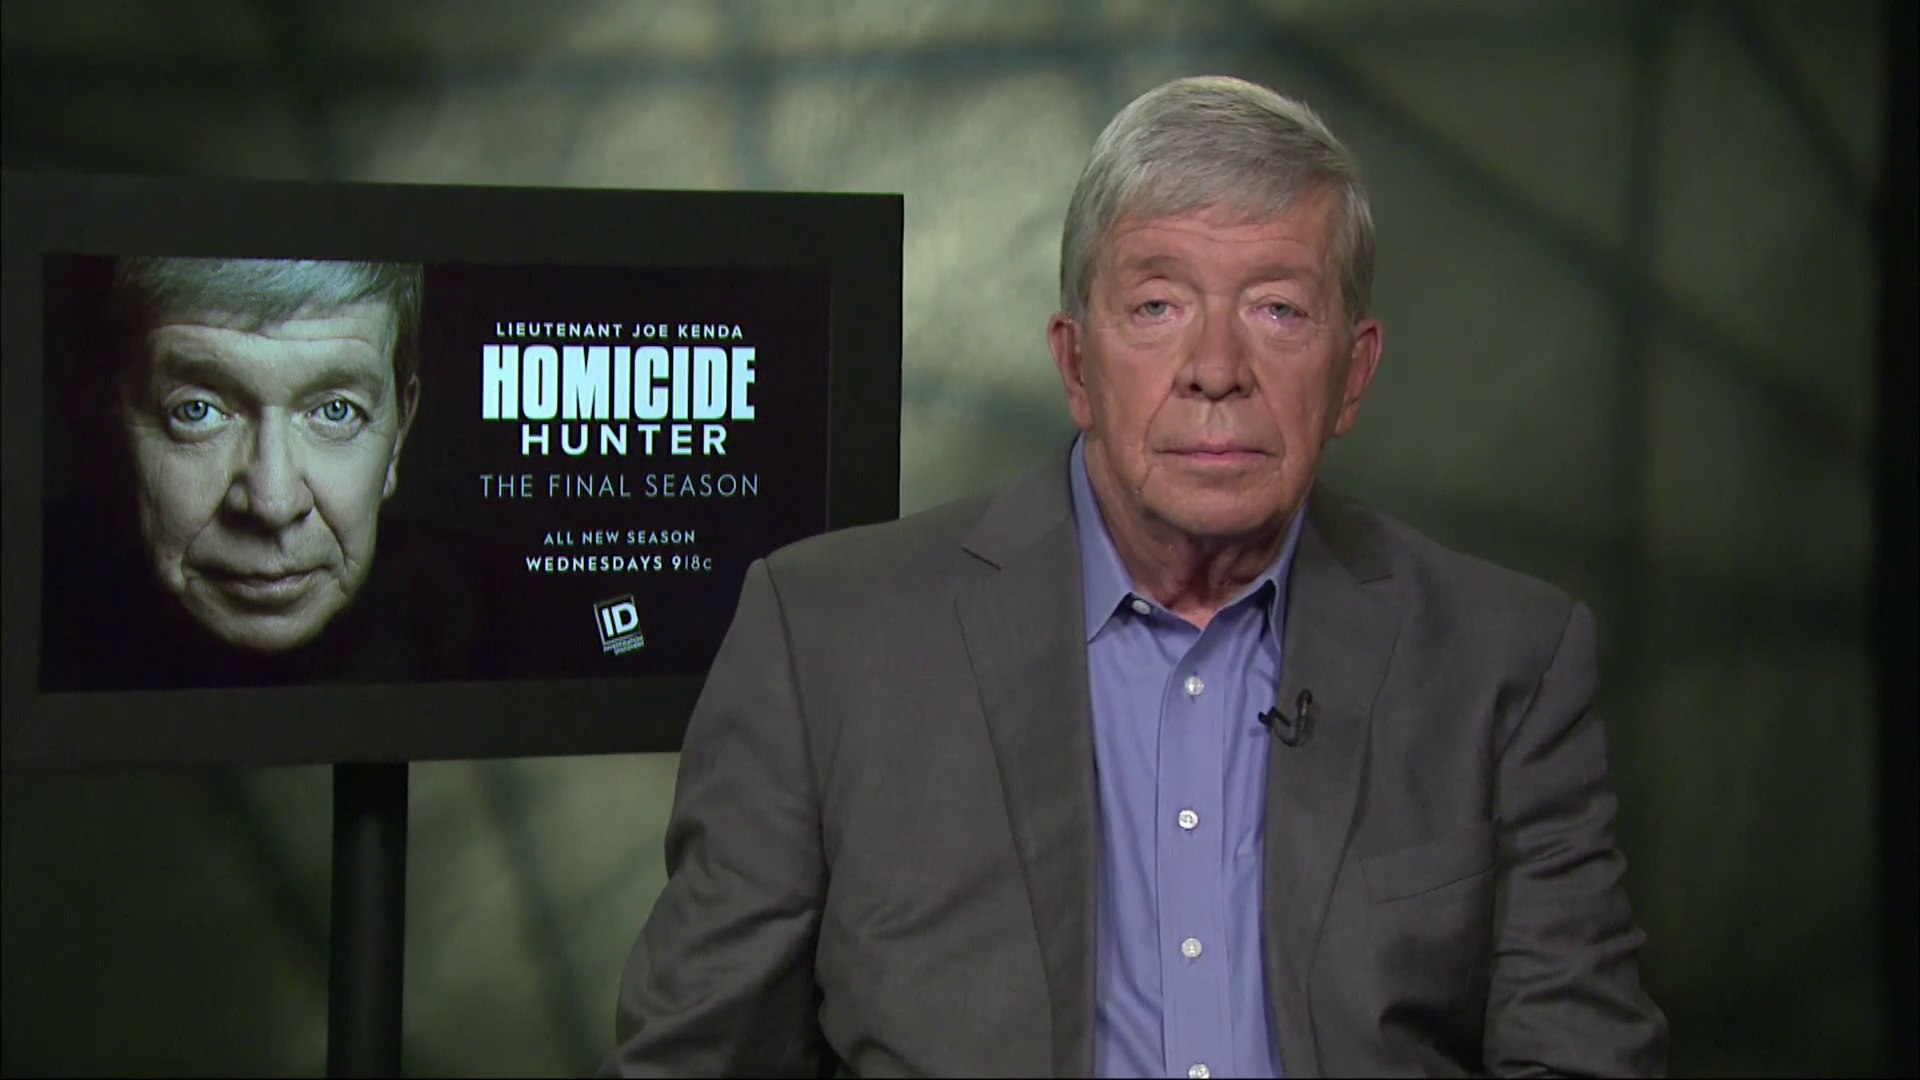 Ir Interview Joe Kenda For Homicide Hunter Investigation Discovery S9